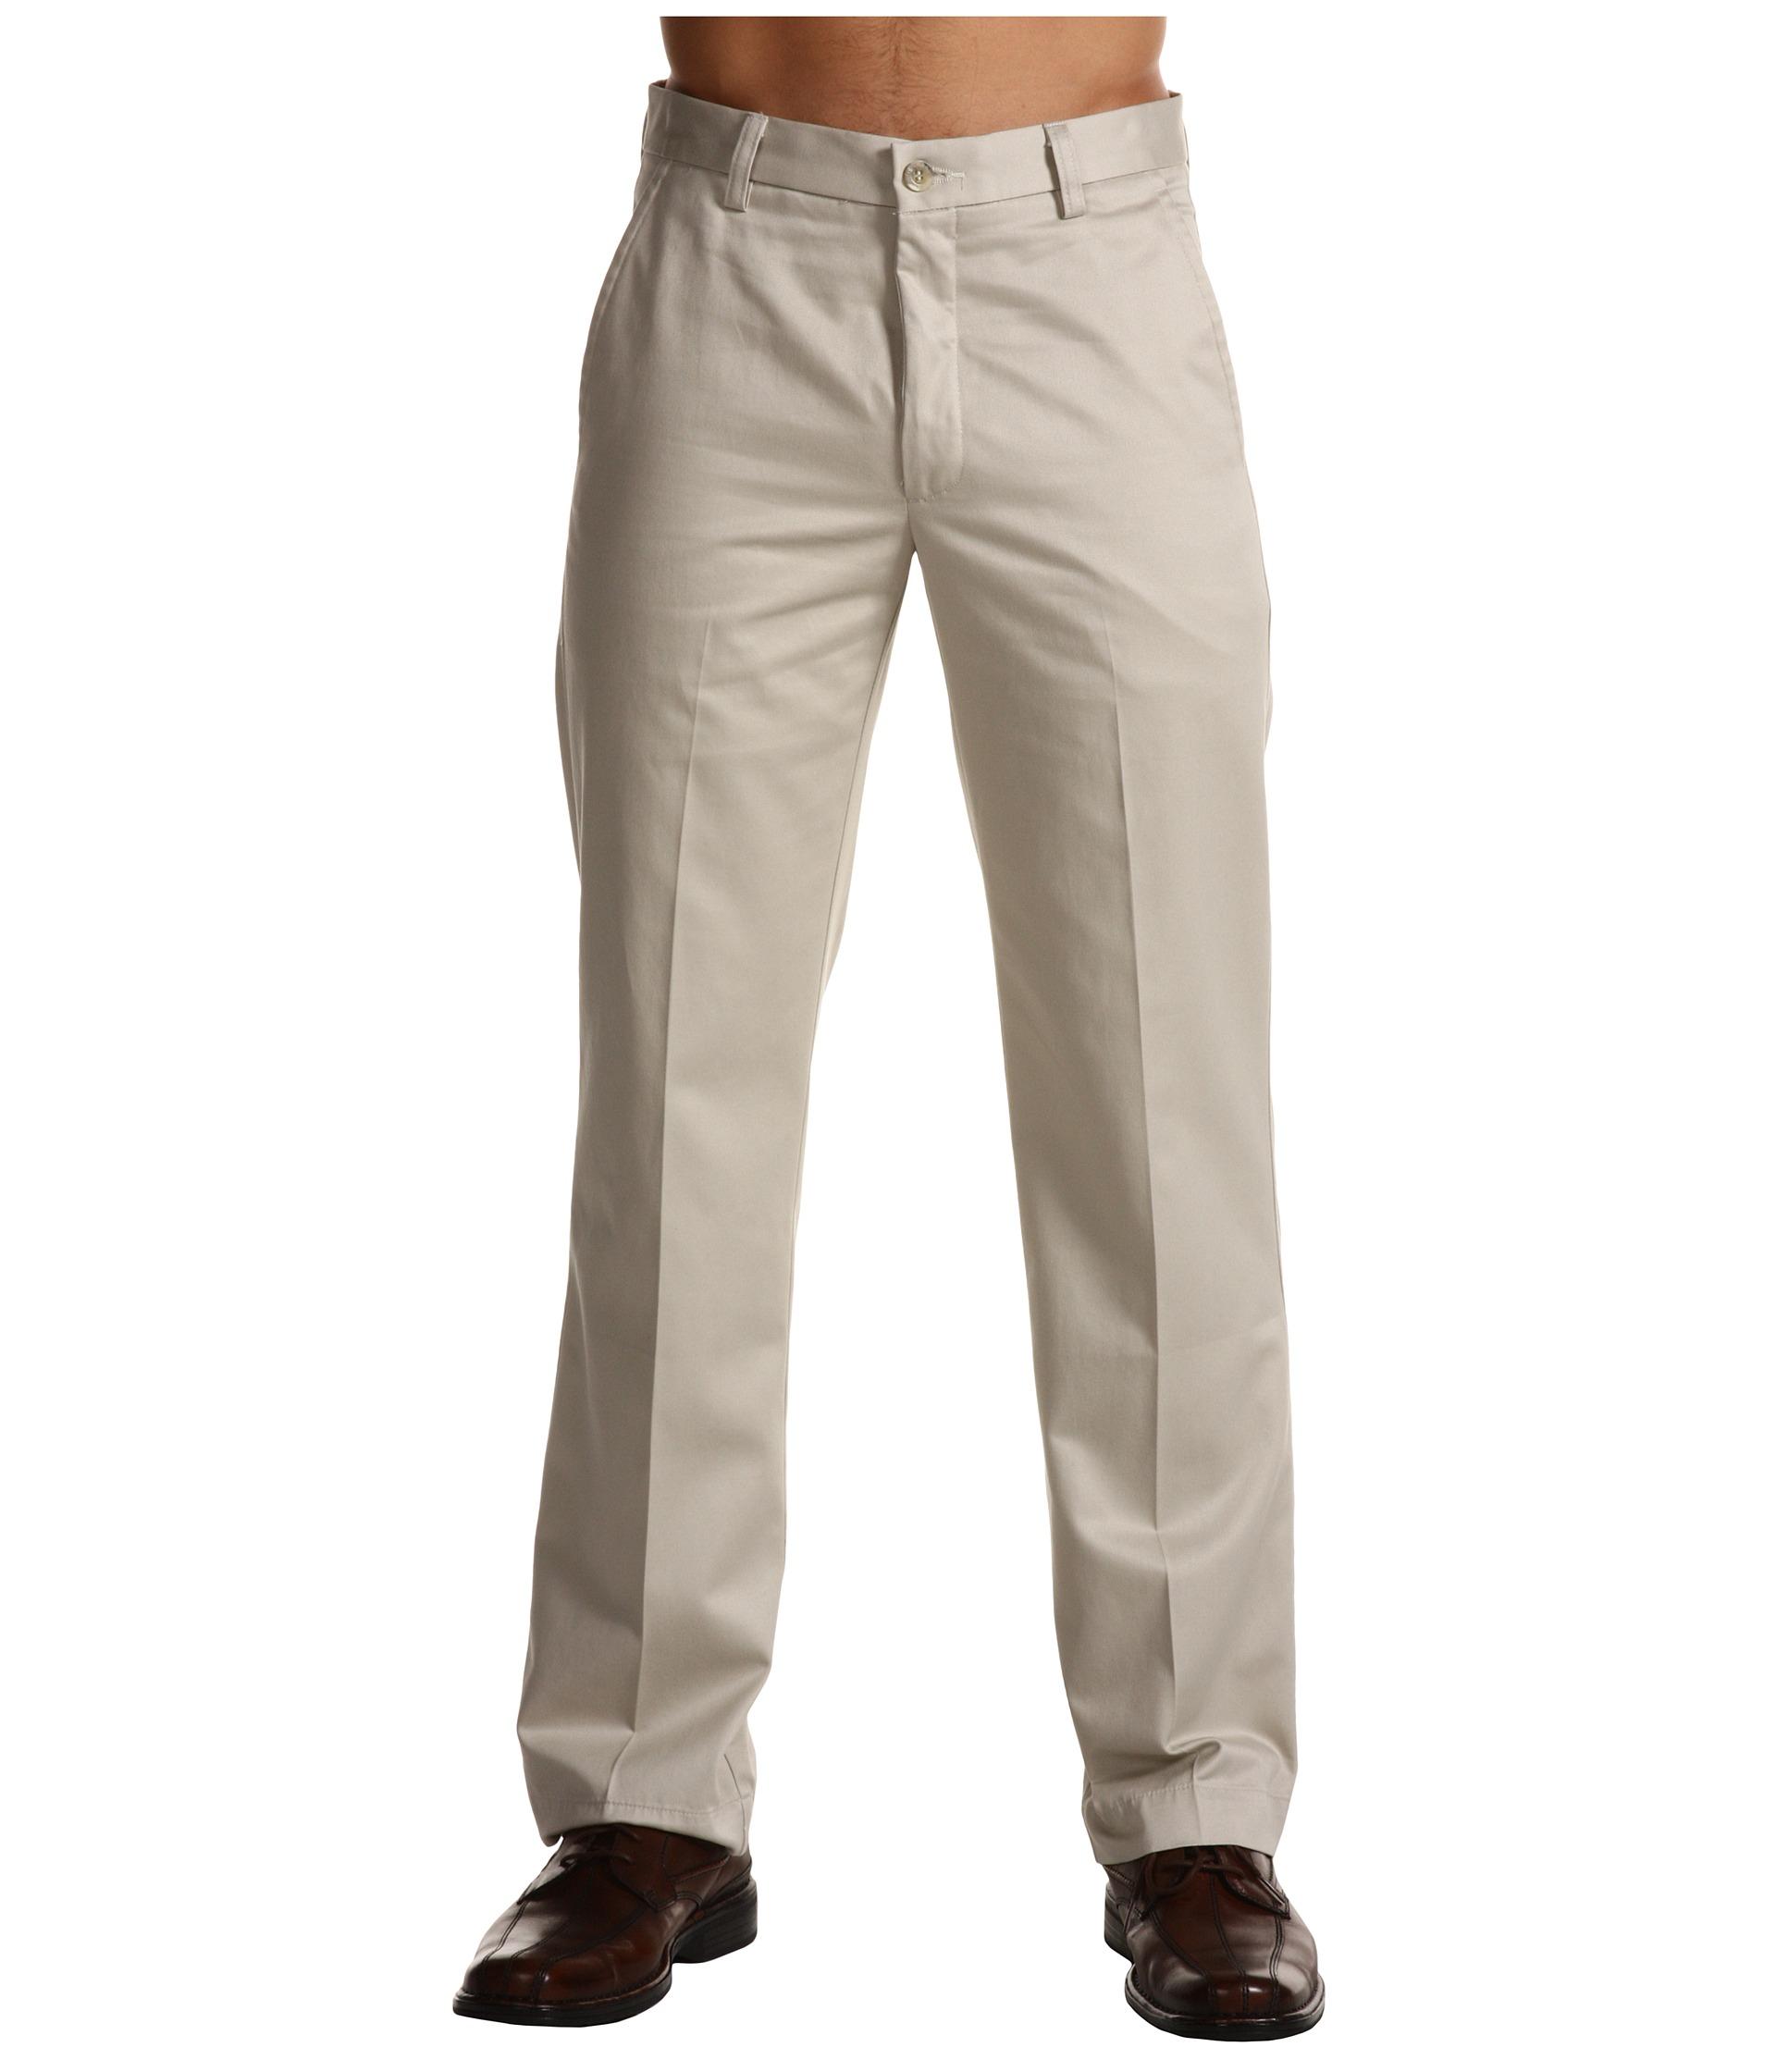 Dockers Signature Khaki D1 Slim Fit Flat Front in Natural